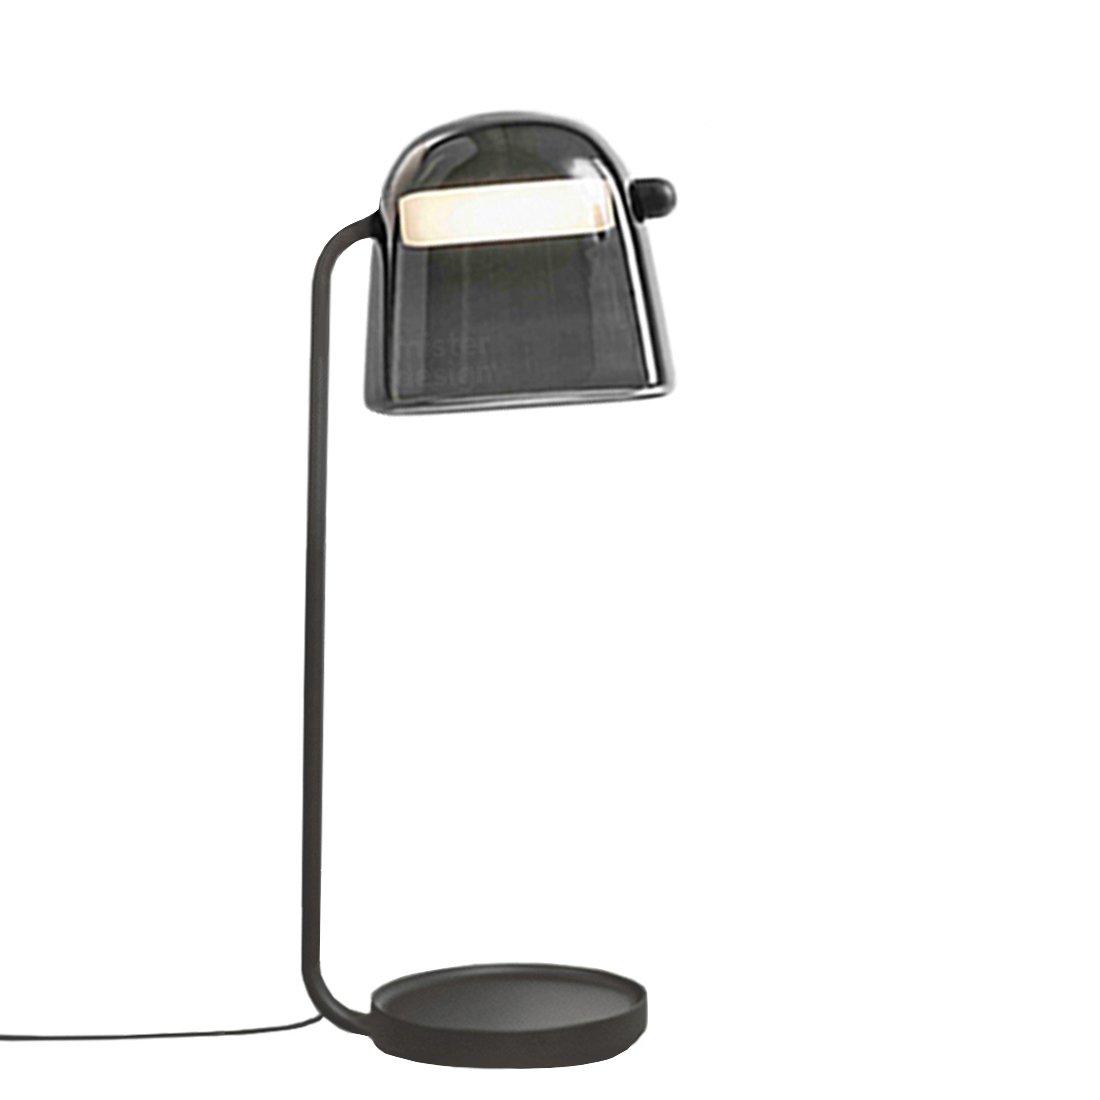 Brokis Mona Vloerlamp Large Zwart - Zwarte Body